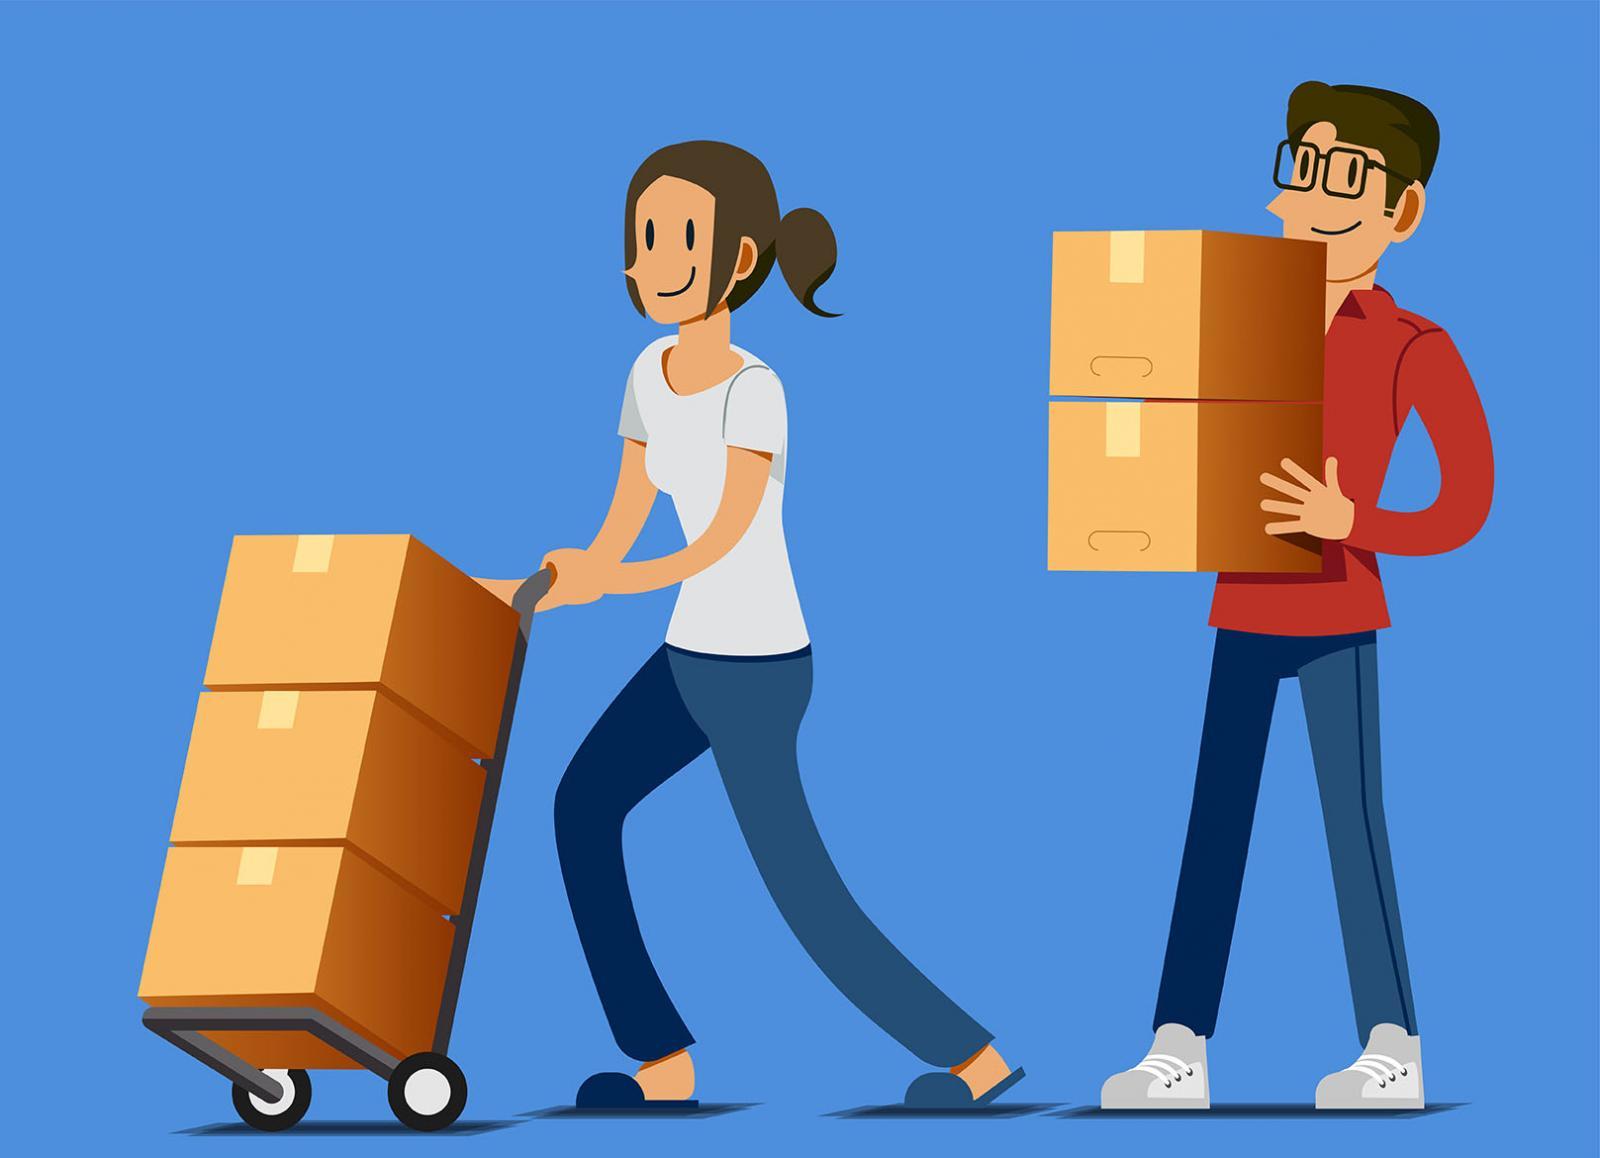 Cartoon couple moving boxes to storage unit